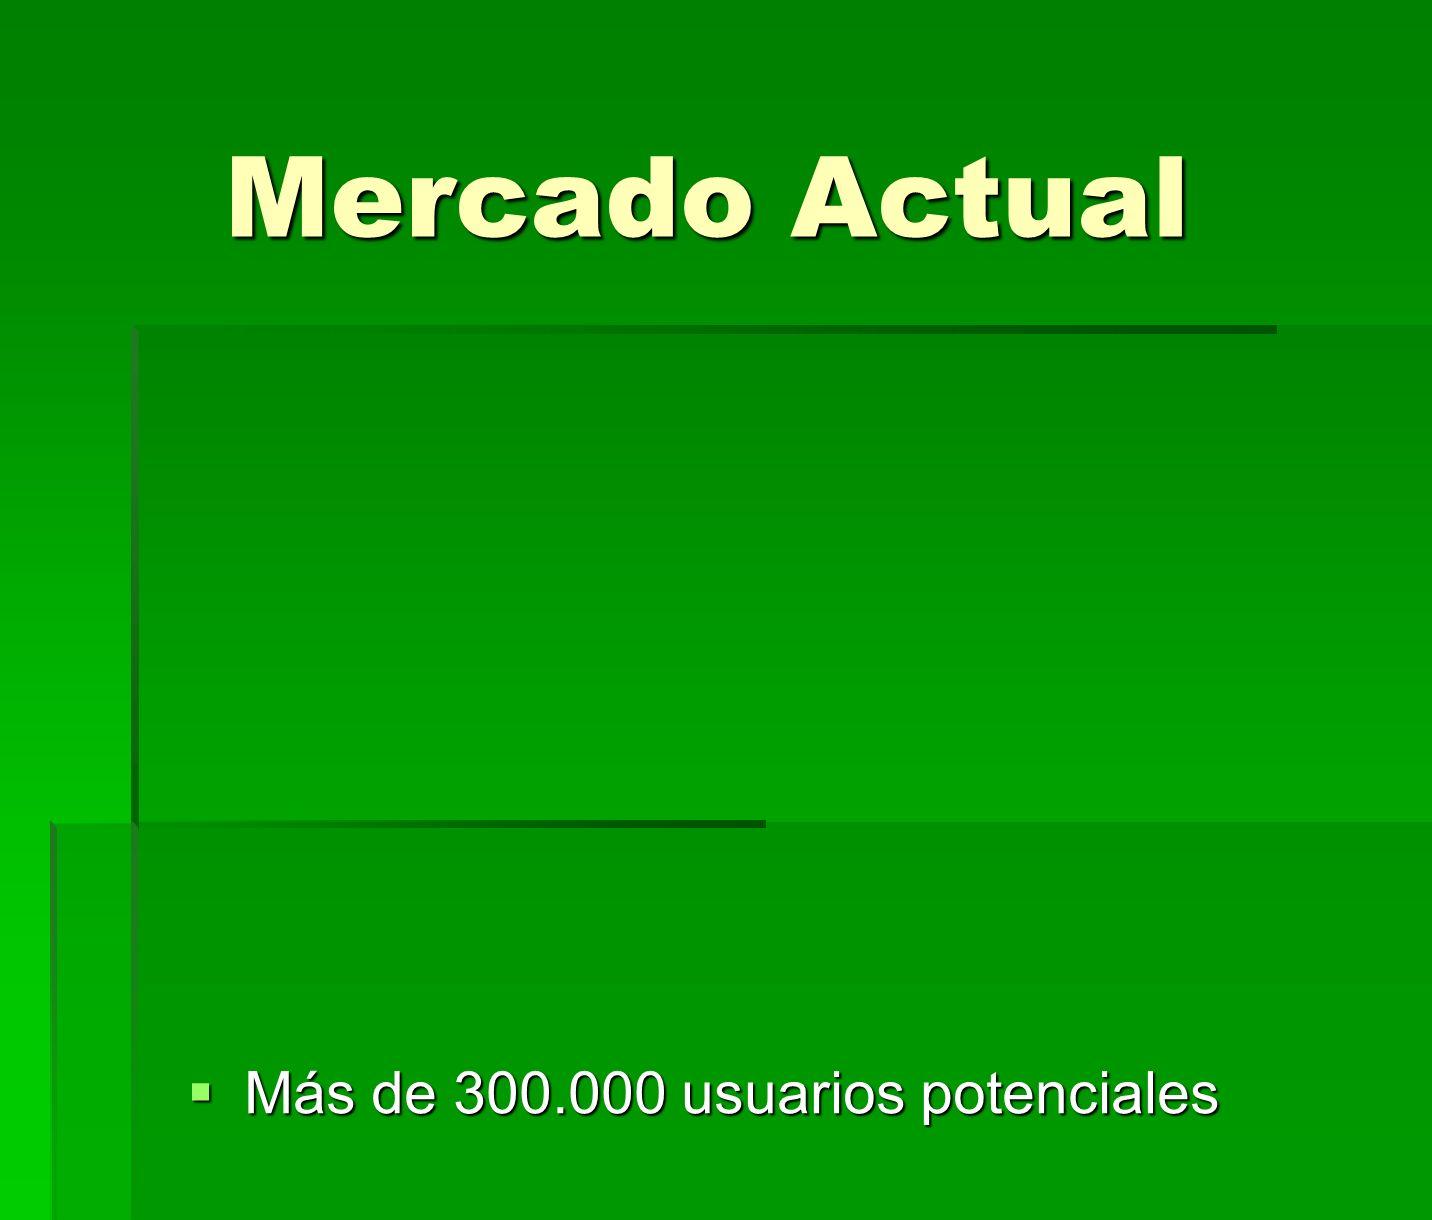 Mercado Actual Mercado Actual Más de 300.000 usuarios potenciales Más de 300.000 usuarios potenciales